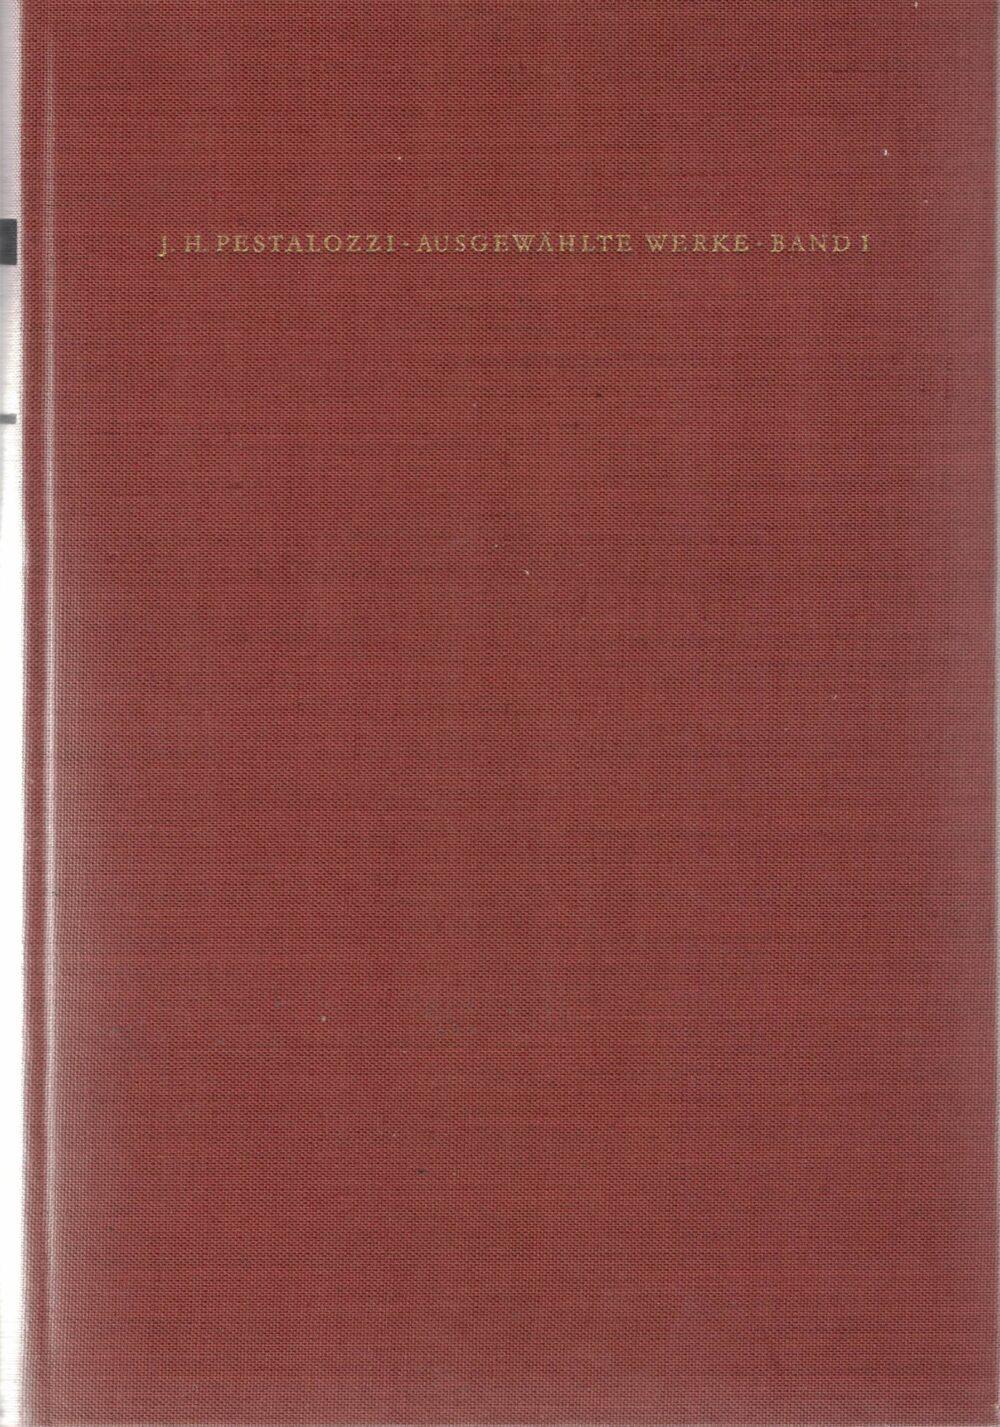 Reihe Pädagogische Bibliothek - Johann Heinrich Pestalozzi